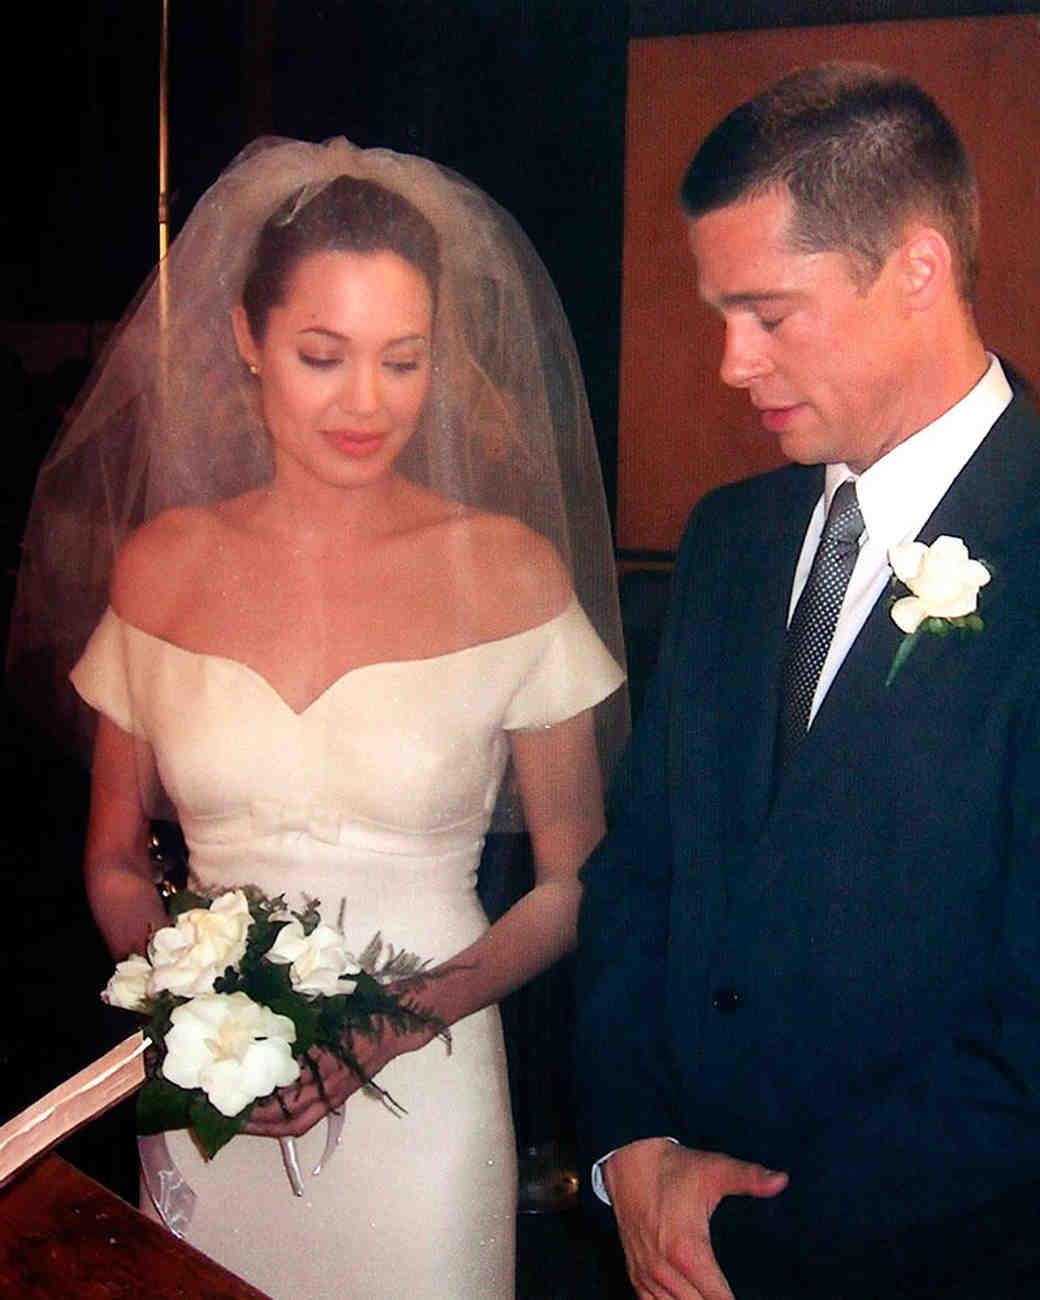 movie-wedding-dresses-mr-and-mrs-smith-angelina-jolie-and-brad-pitt-0316.jpg